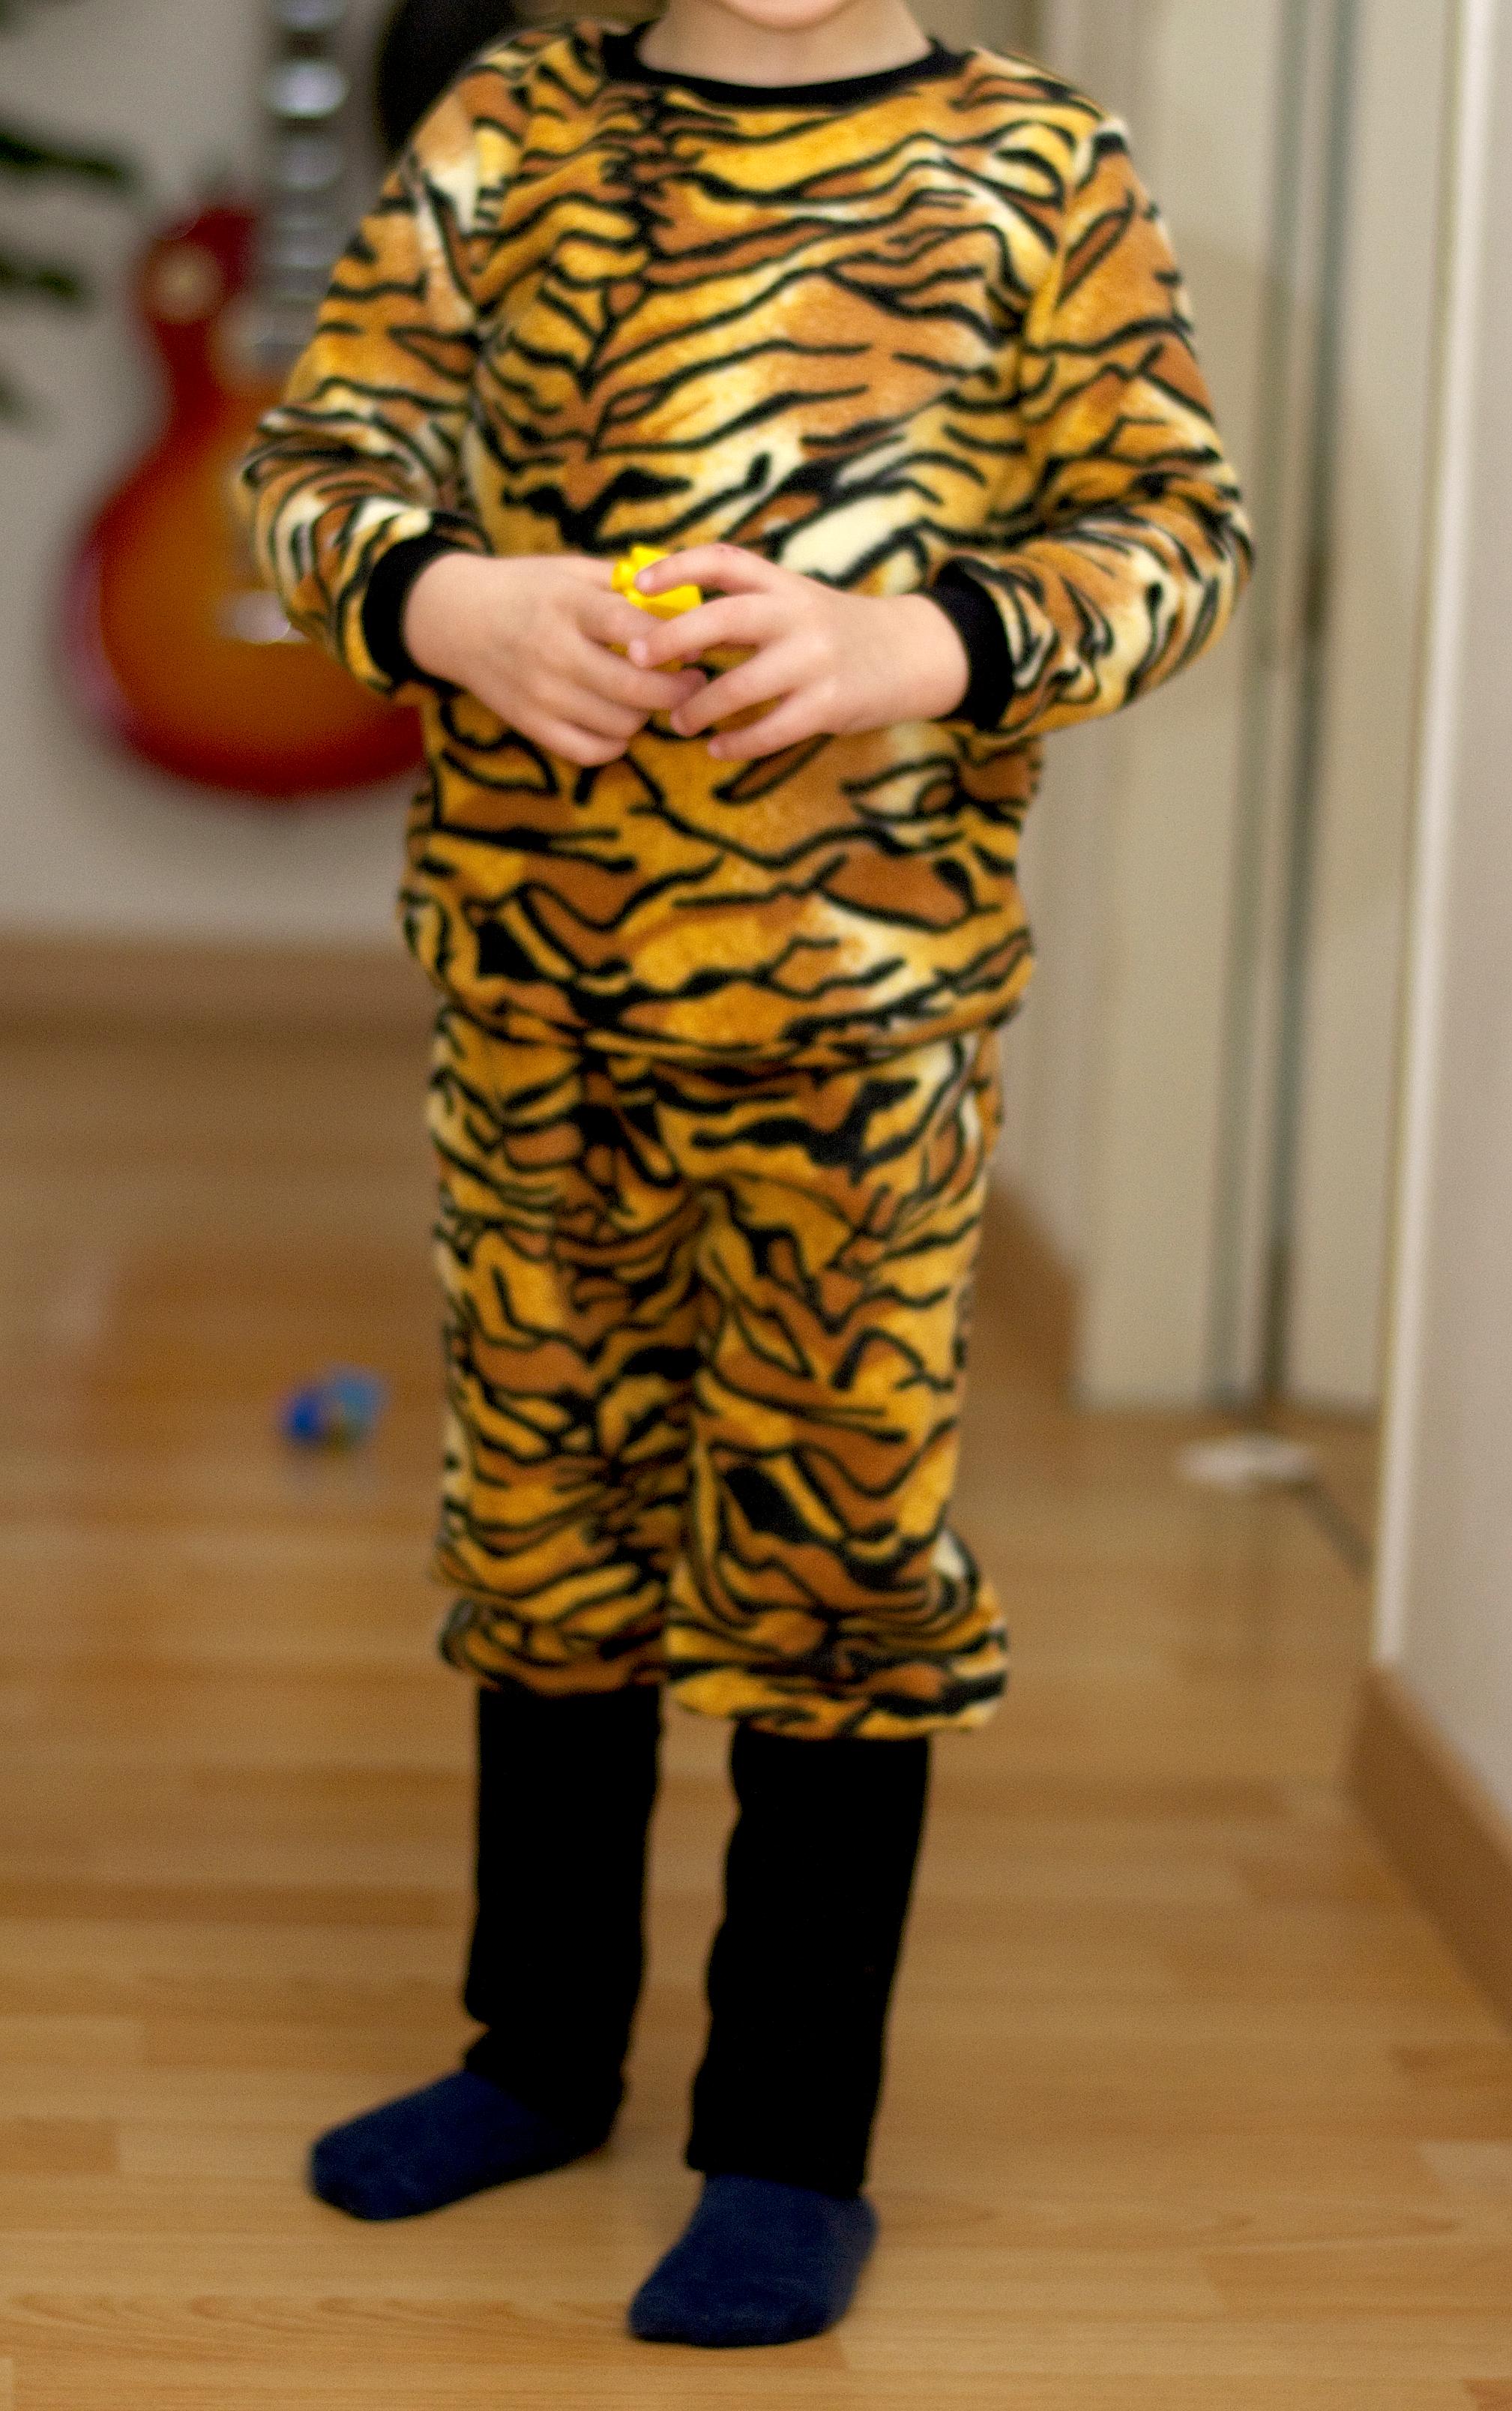 Tigerkostüm_ganz